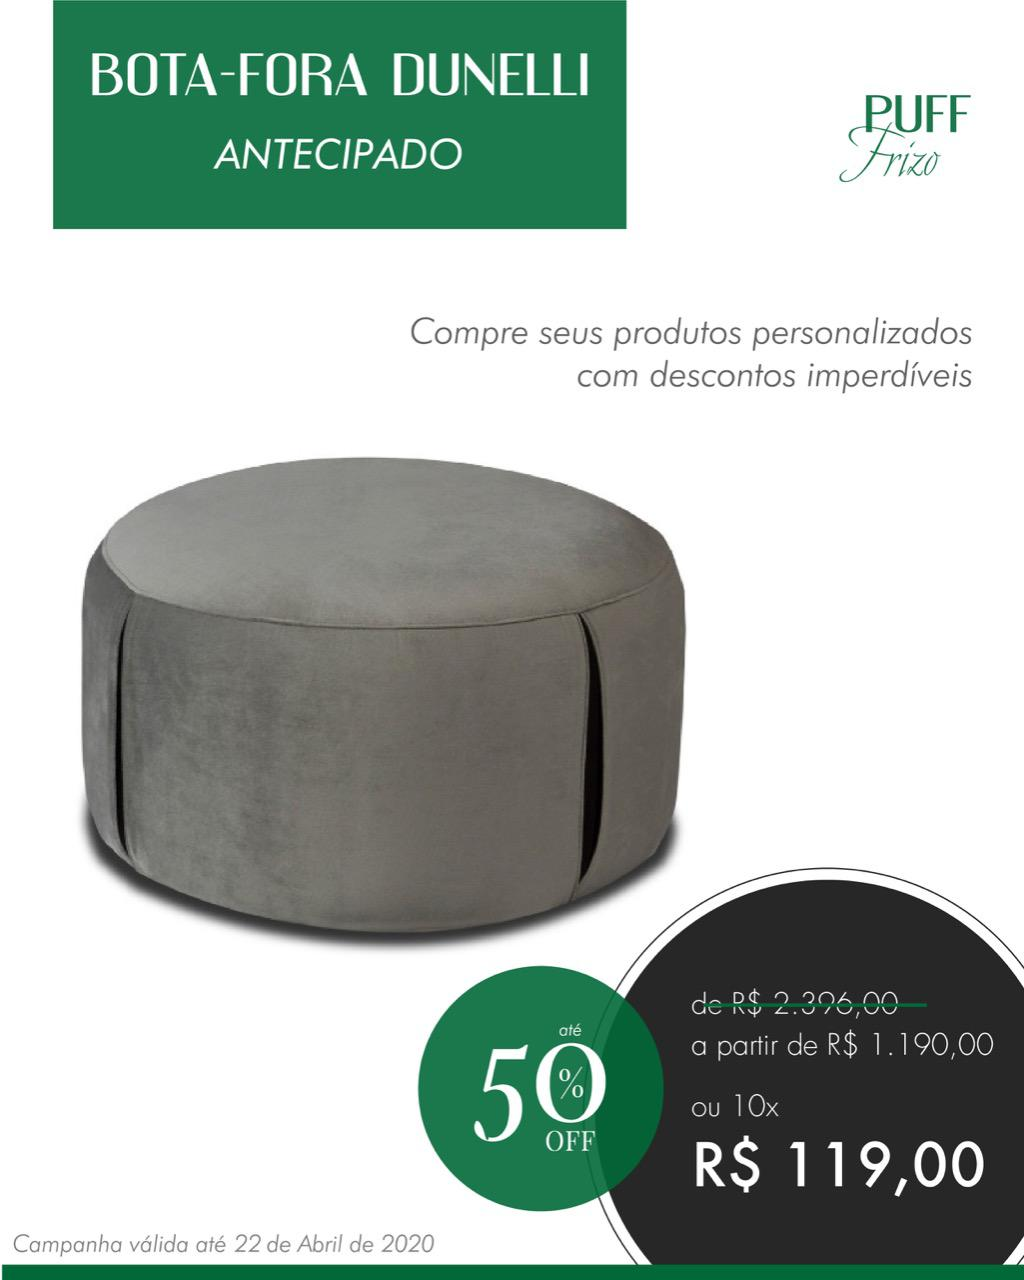 Pedido online whats (11) 95148-5596 ou vinicius.gerencia@dunellianalia.com.br